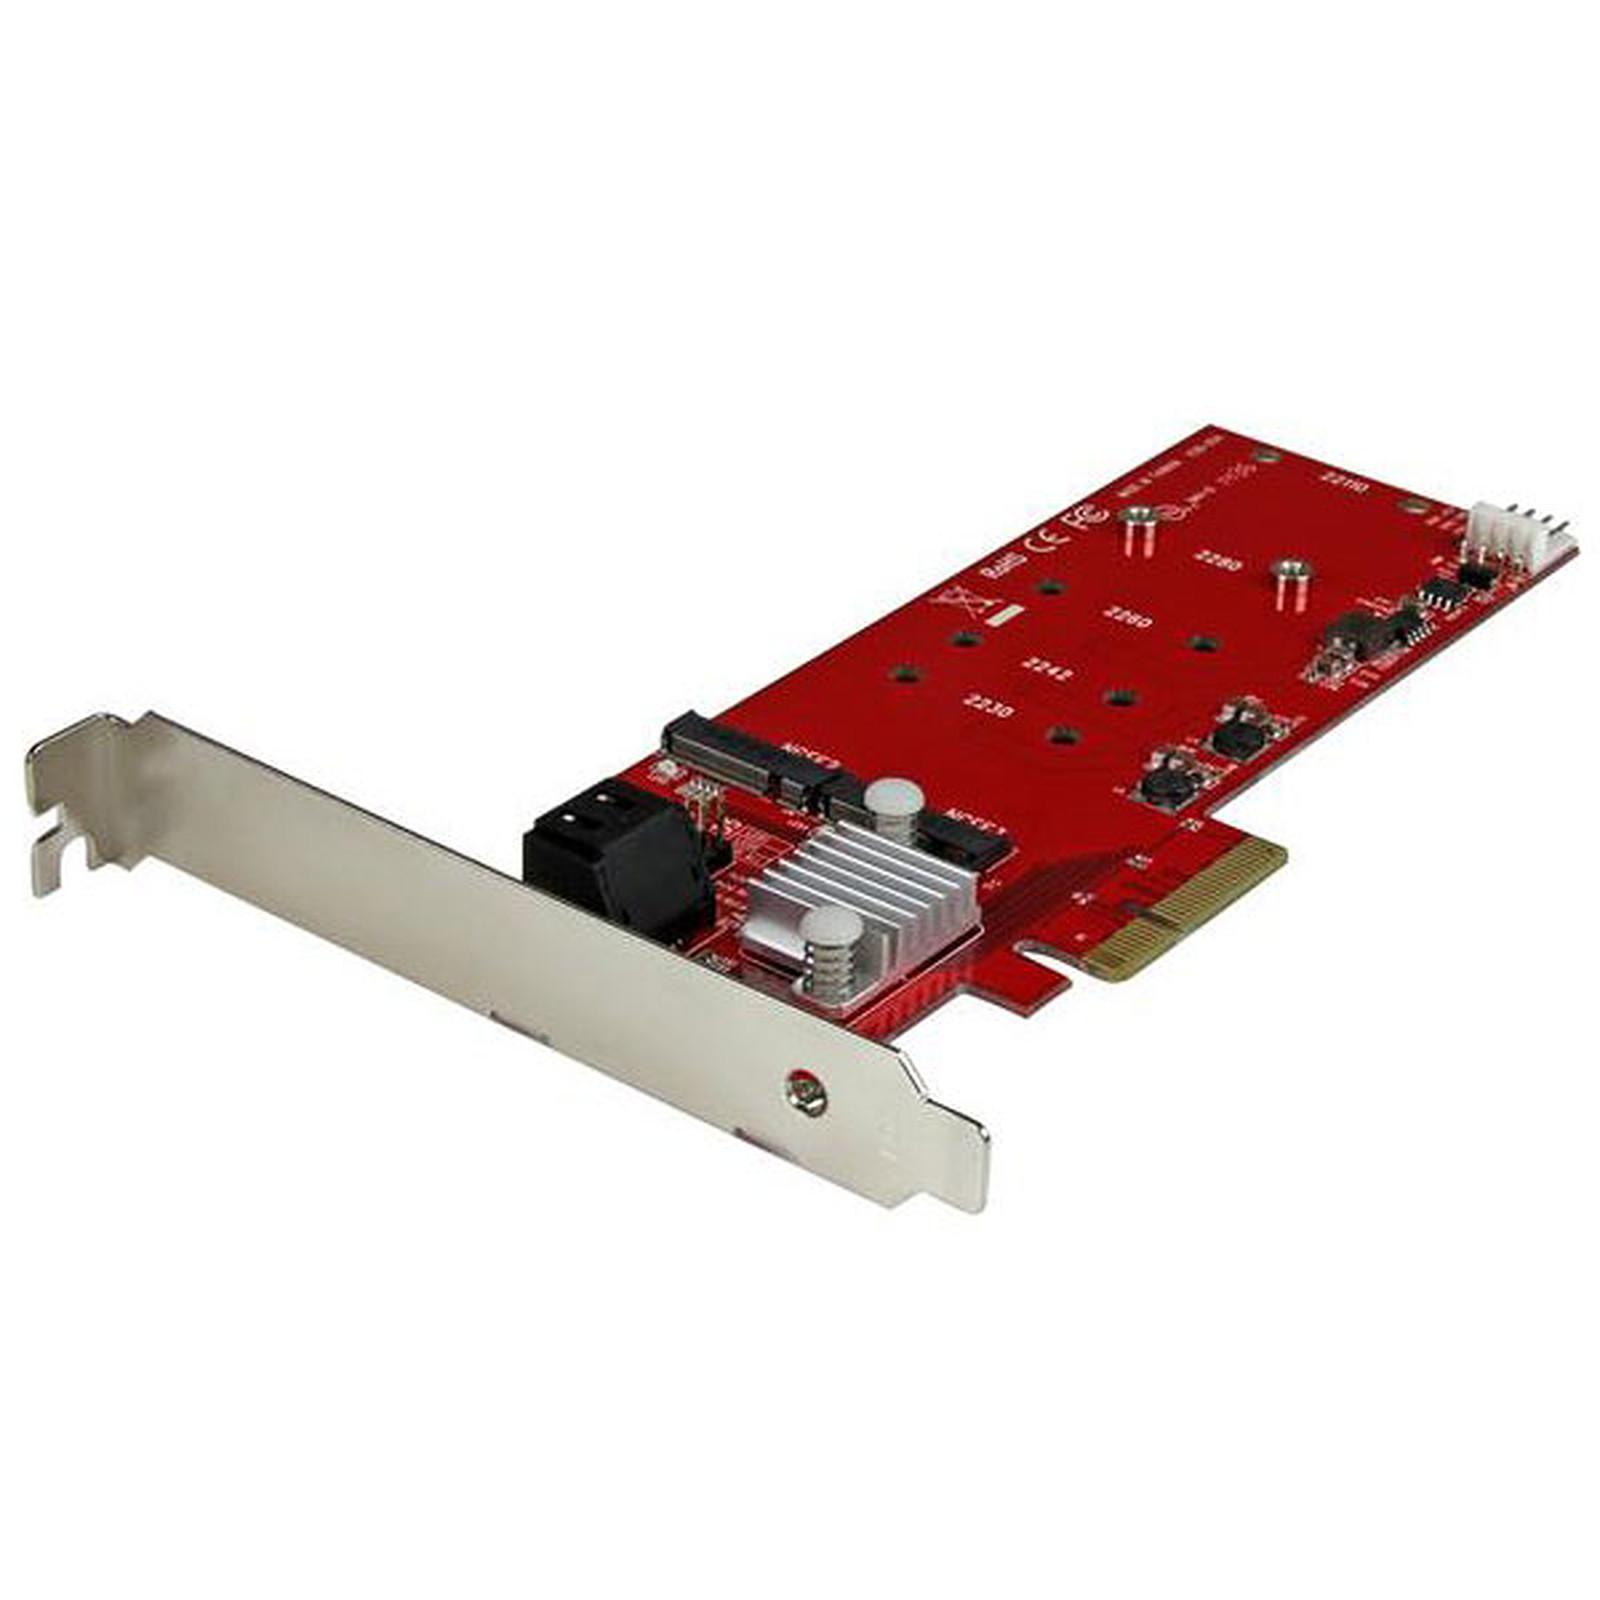 StarTech.com PEXM2SAT3422